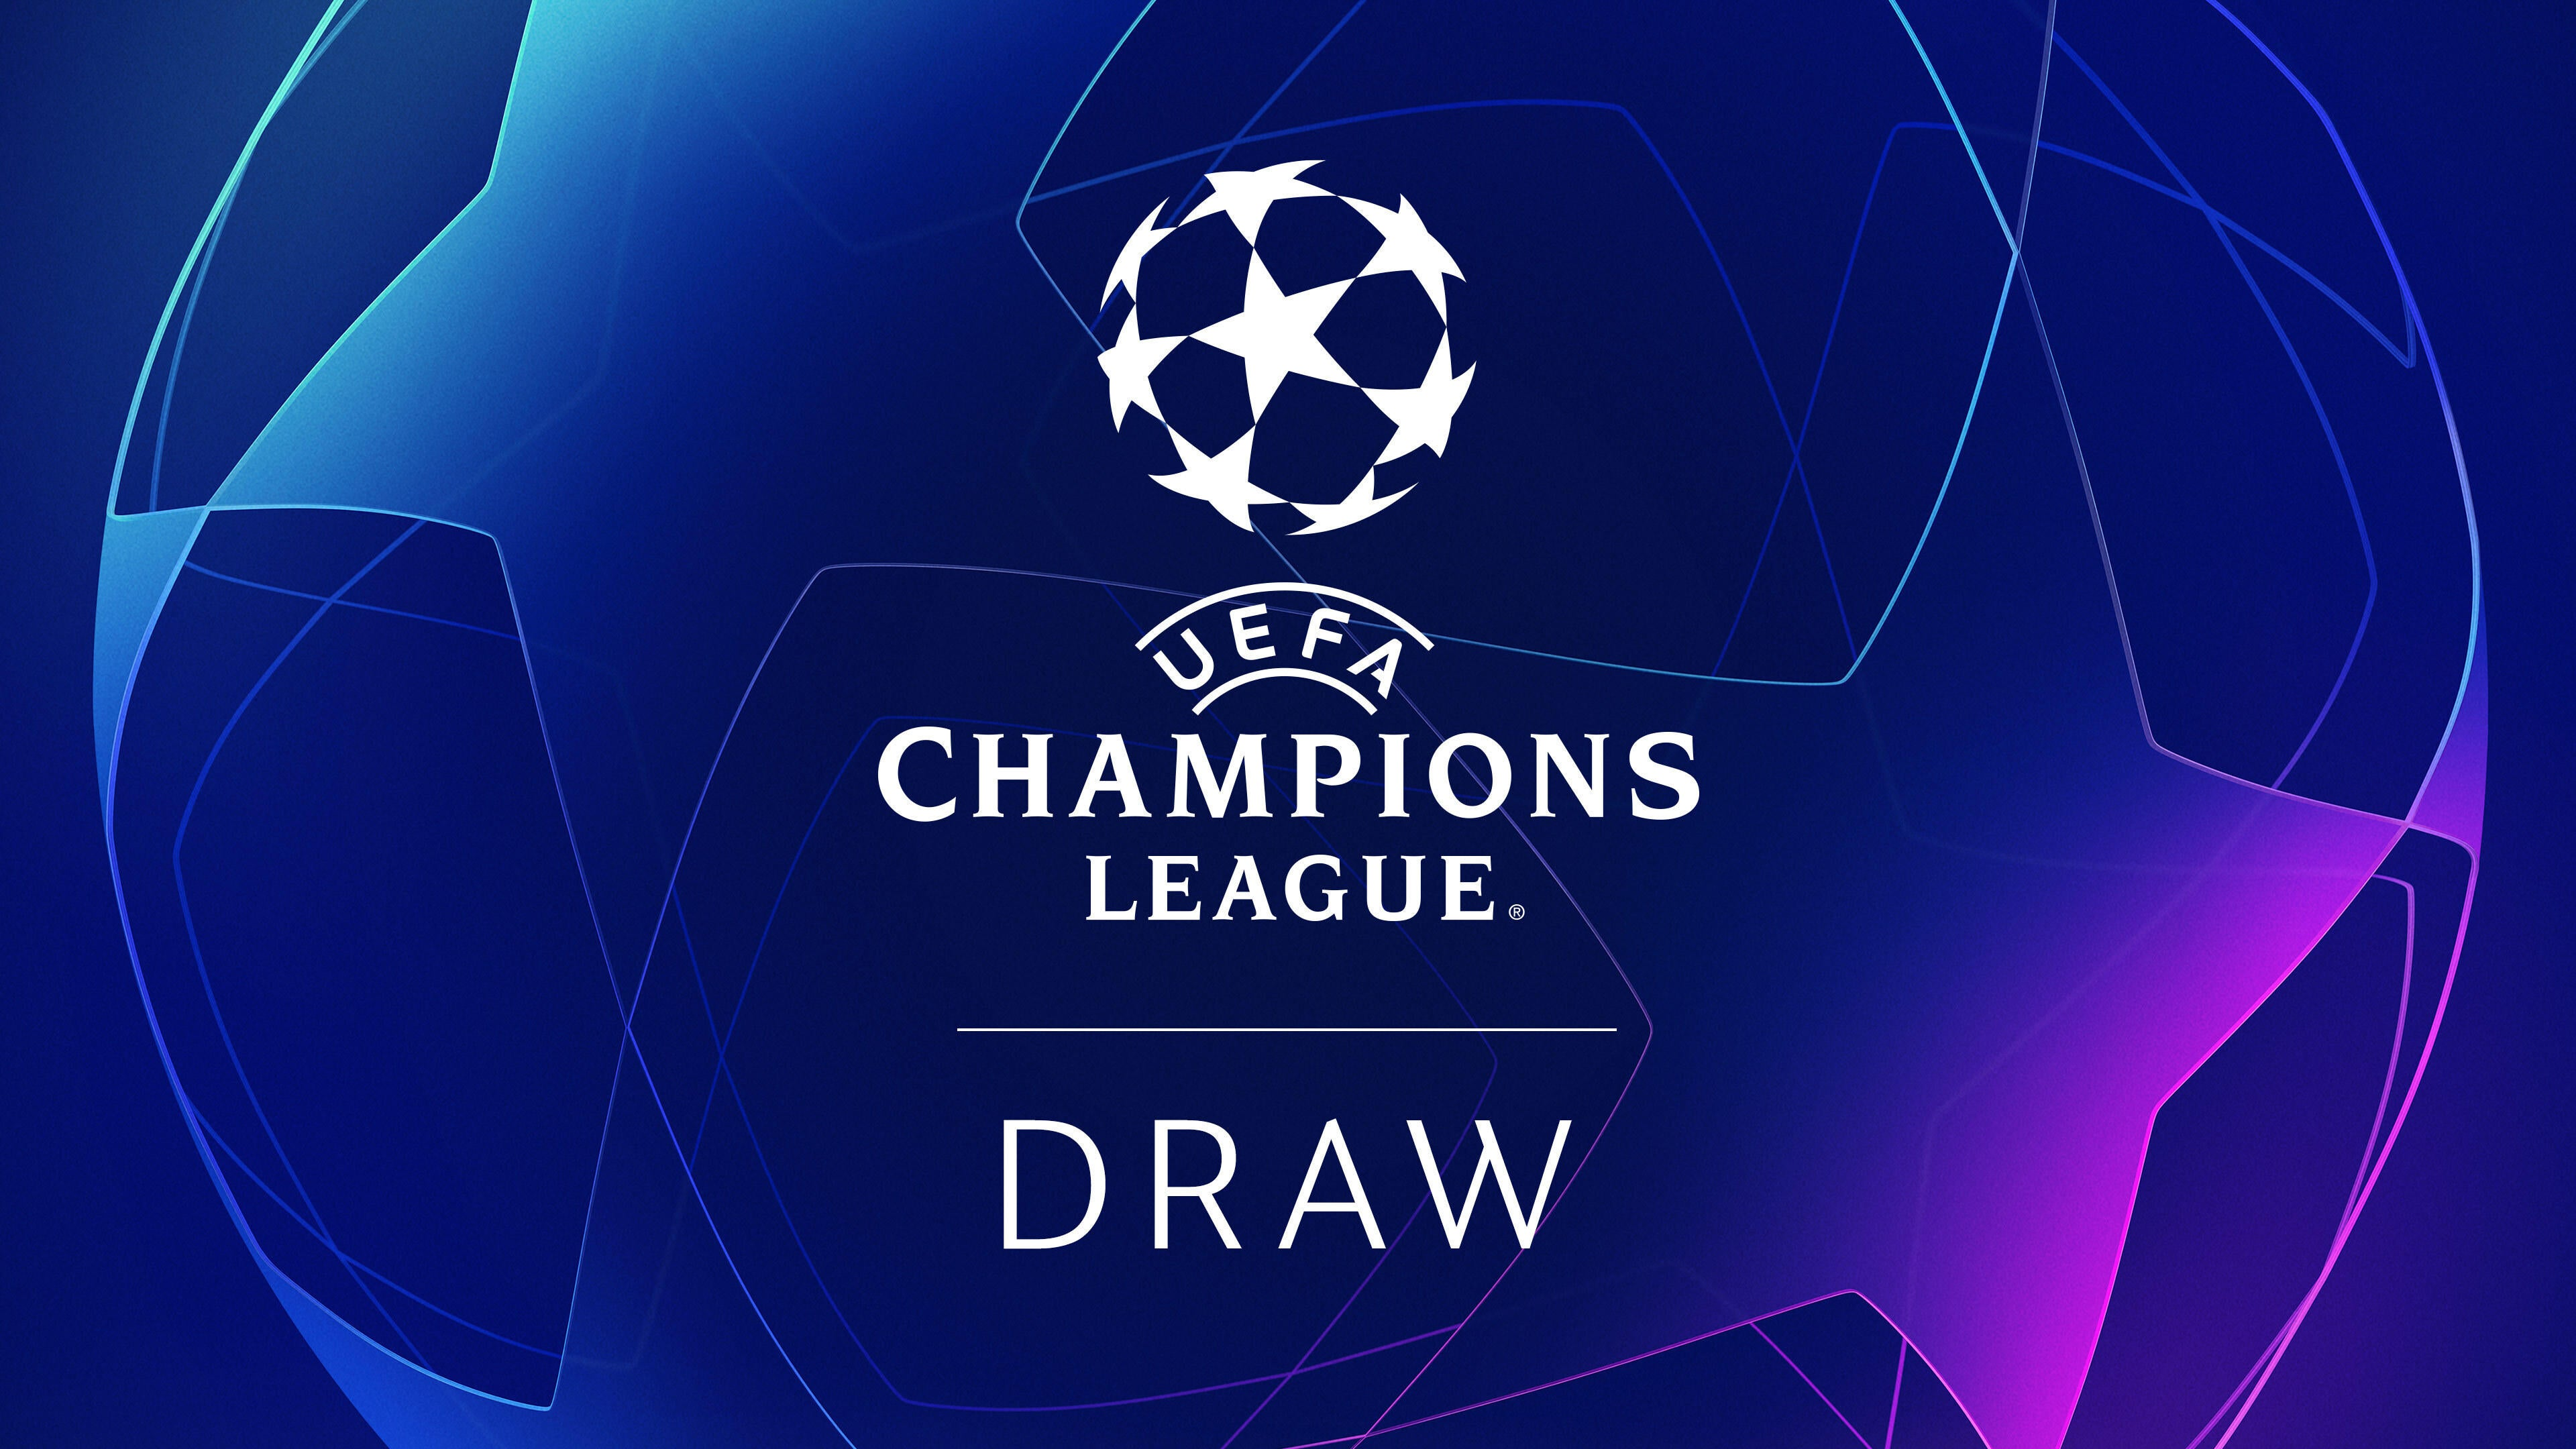 uefa-champions-draw